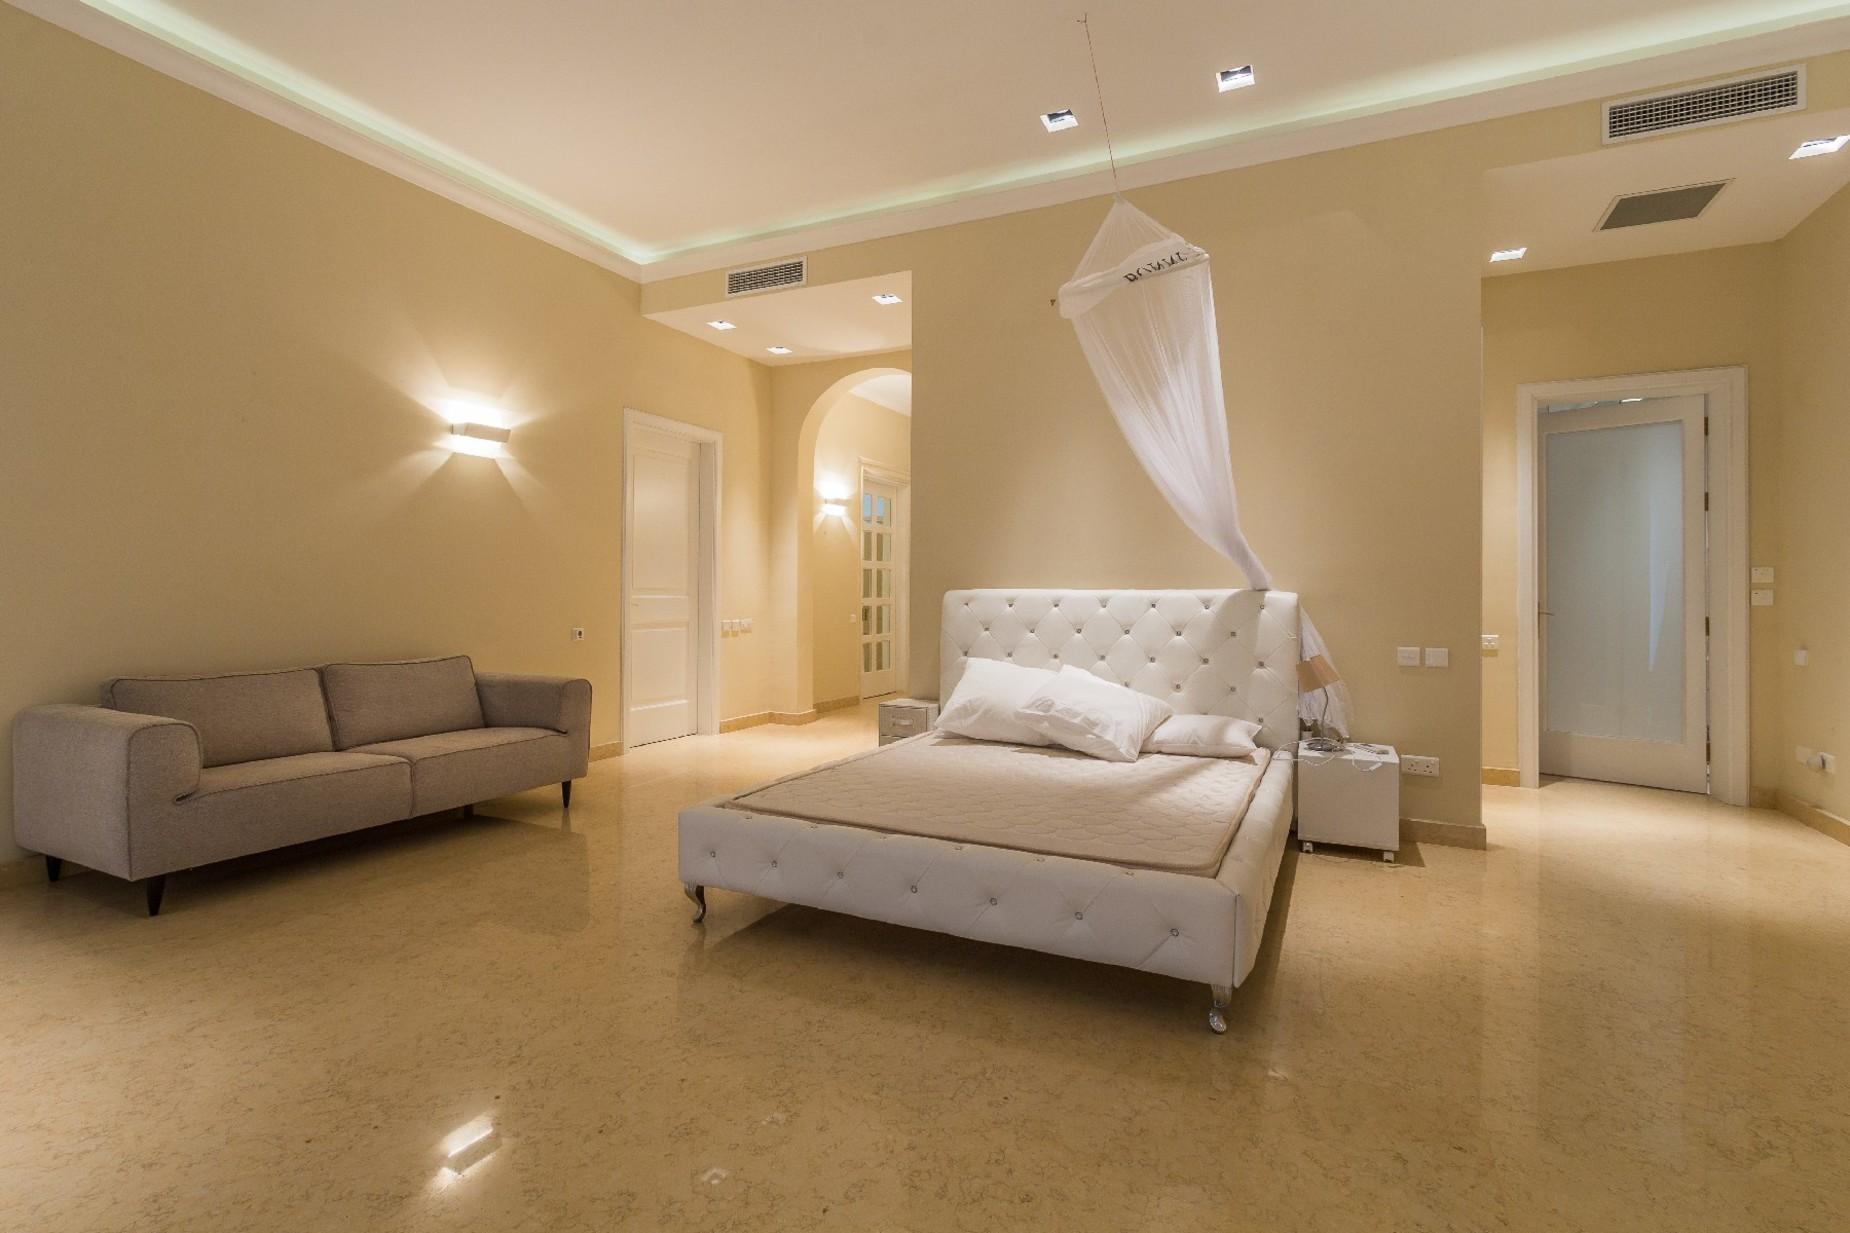 6 bed Palazzo For Rent in Balzan, Balzan - thumb 9